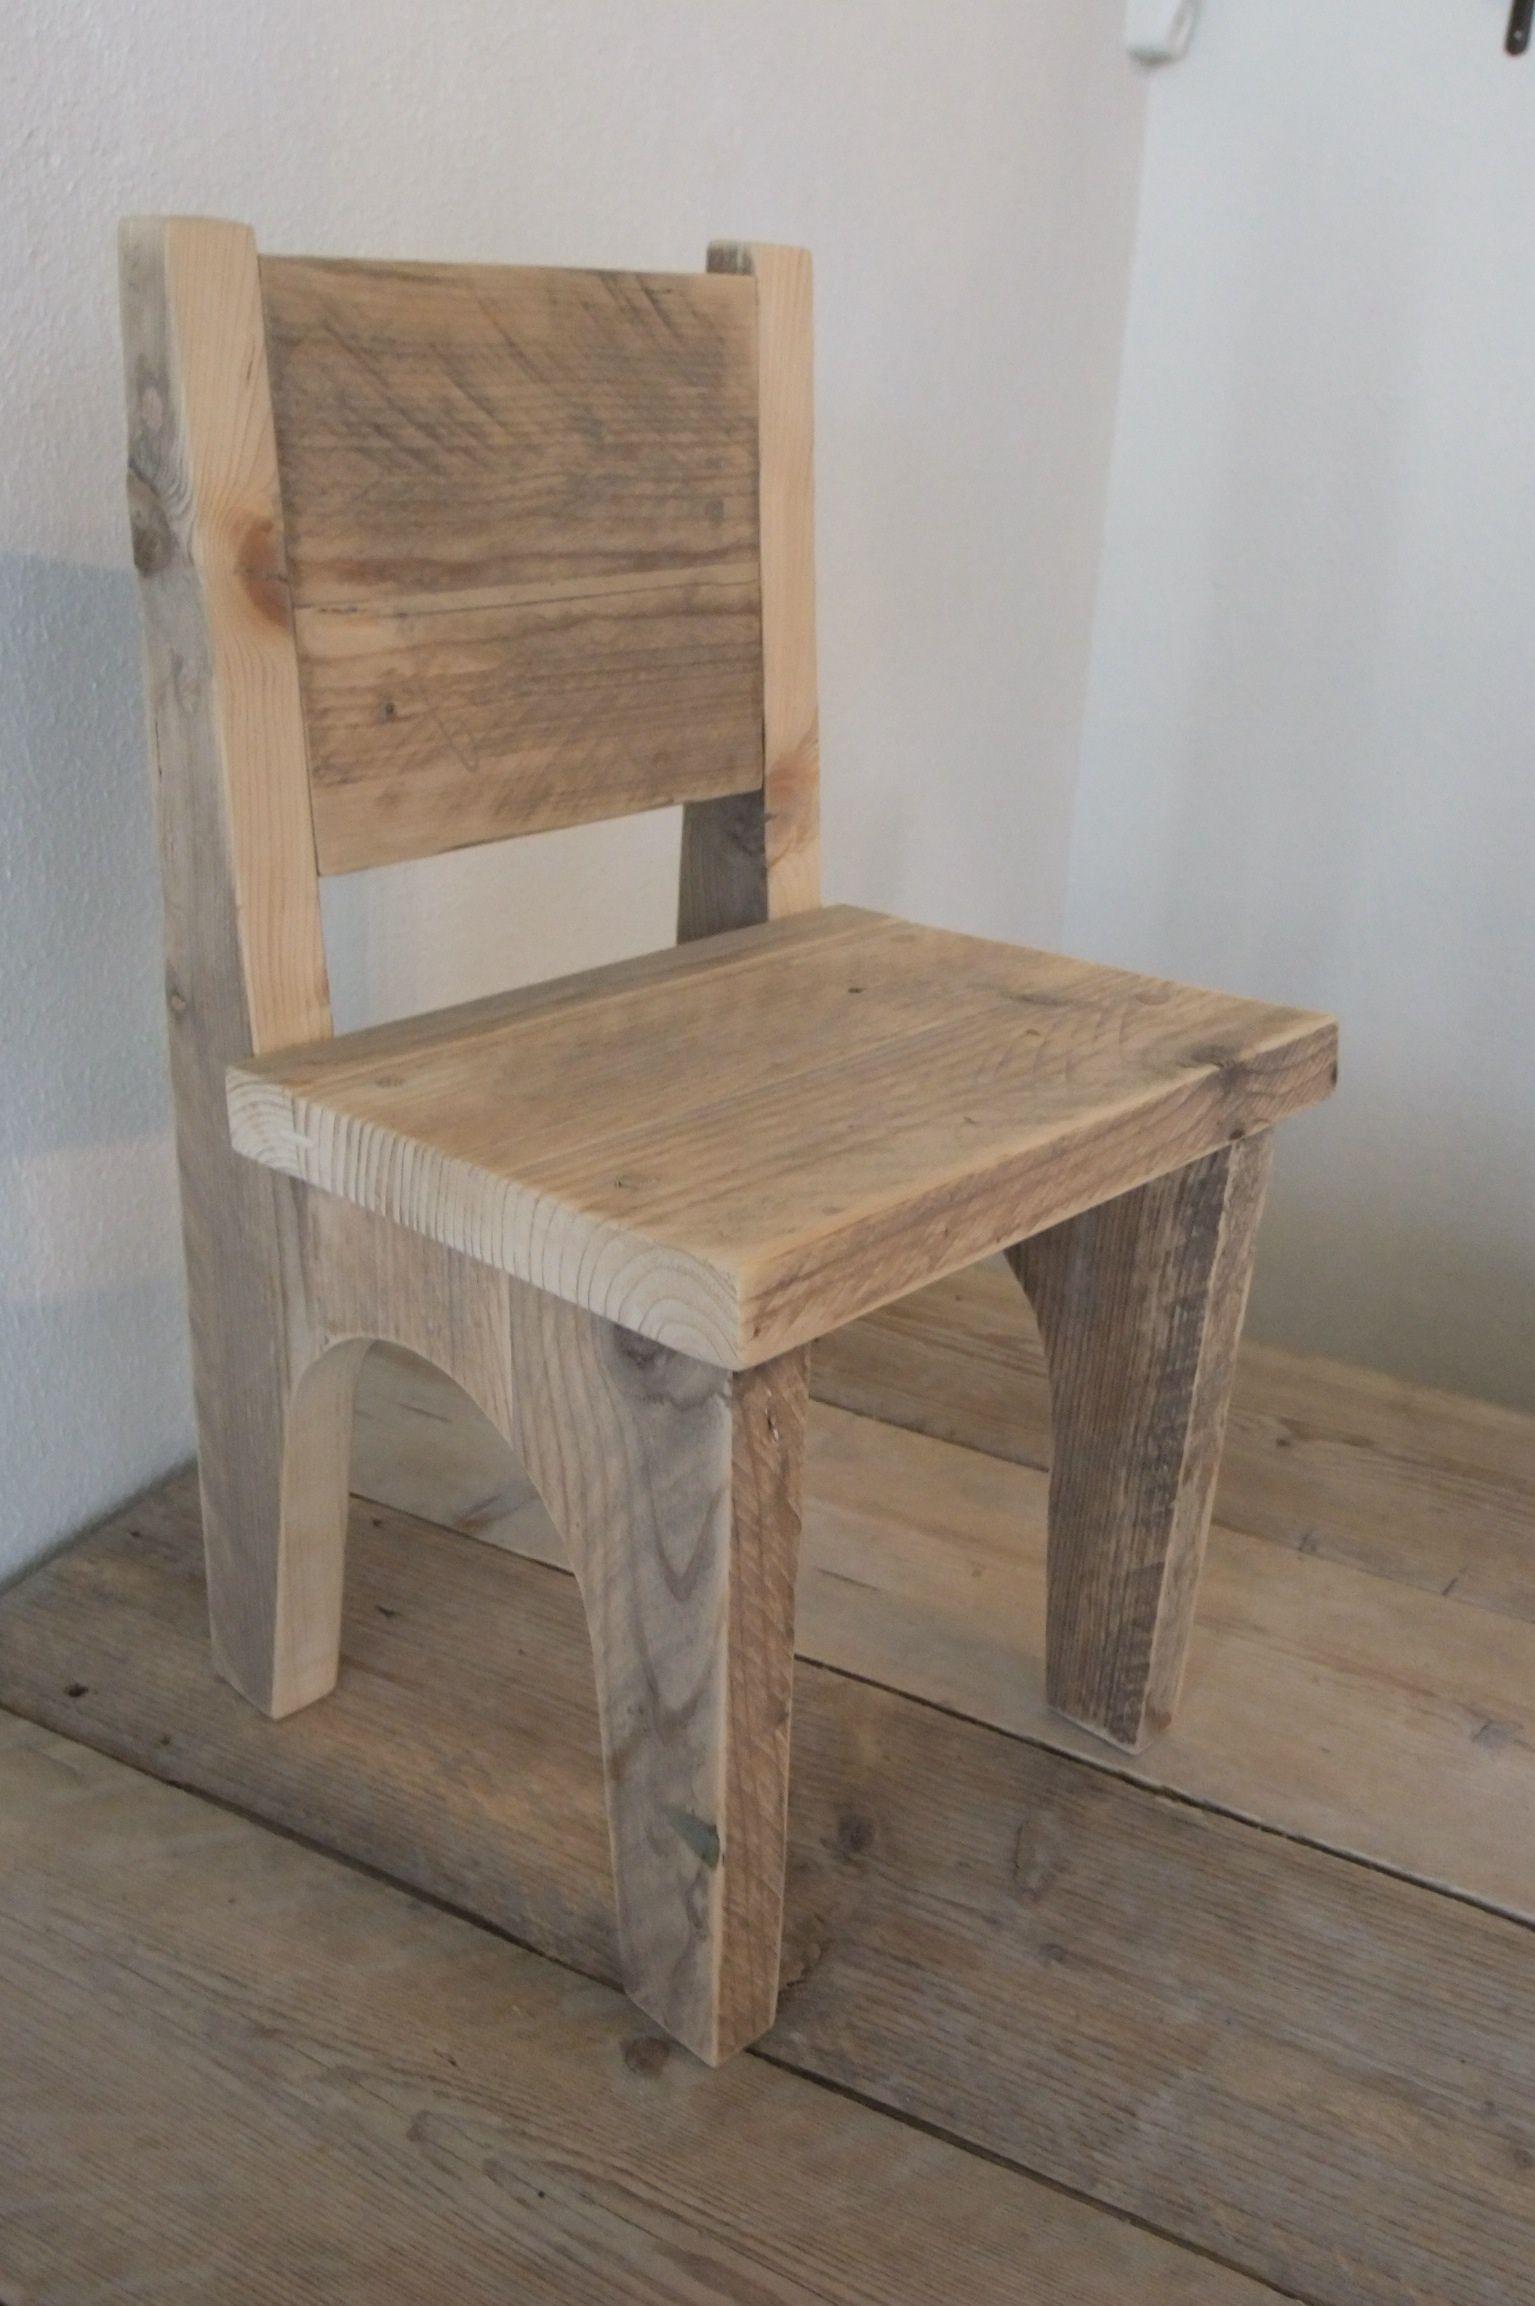 Pin de J J en furniture to make/ideas | Pinterest | Sillas ...